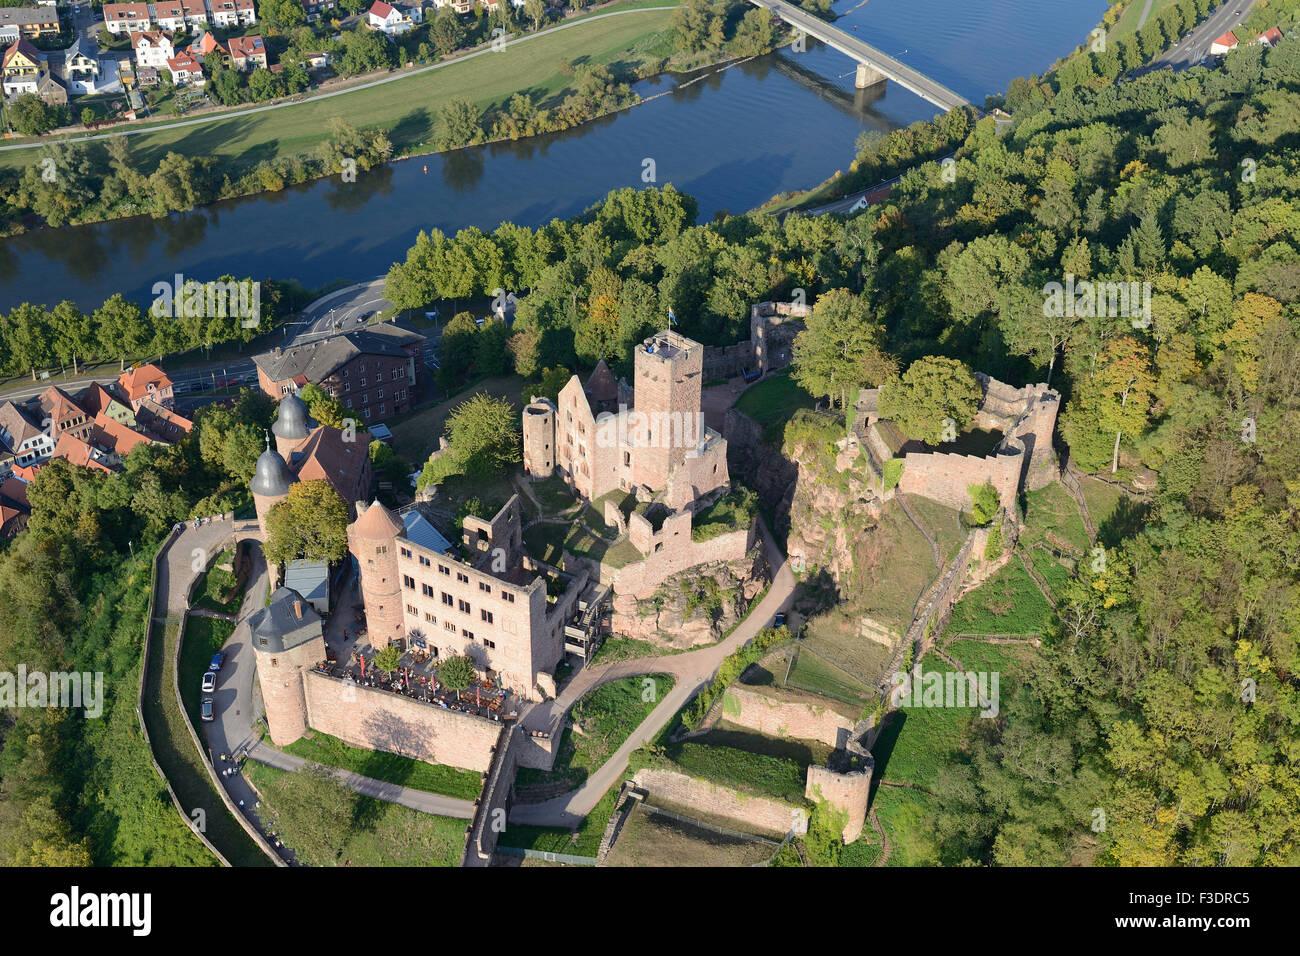 WERTHEIM château surplombant la rivière principale (vue aérienne). Wertheim am Main, Bade-Wurtemberg, Photo Stock